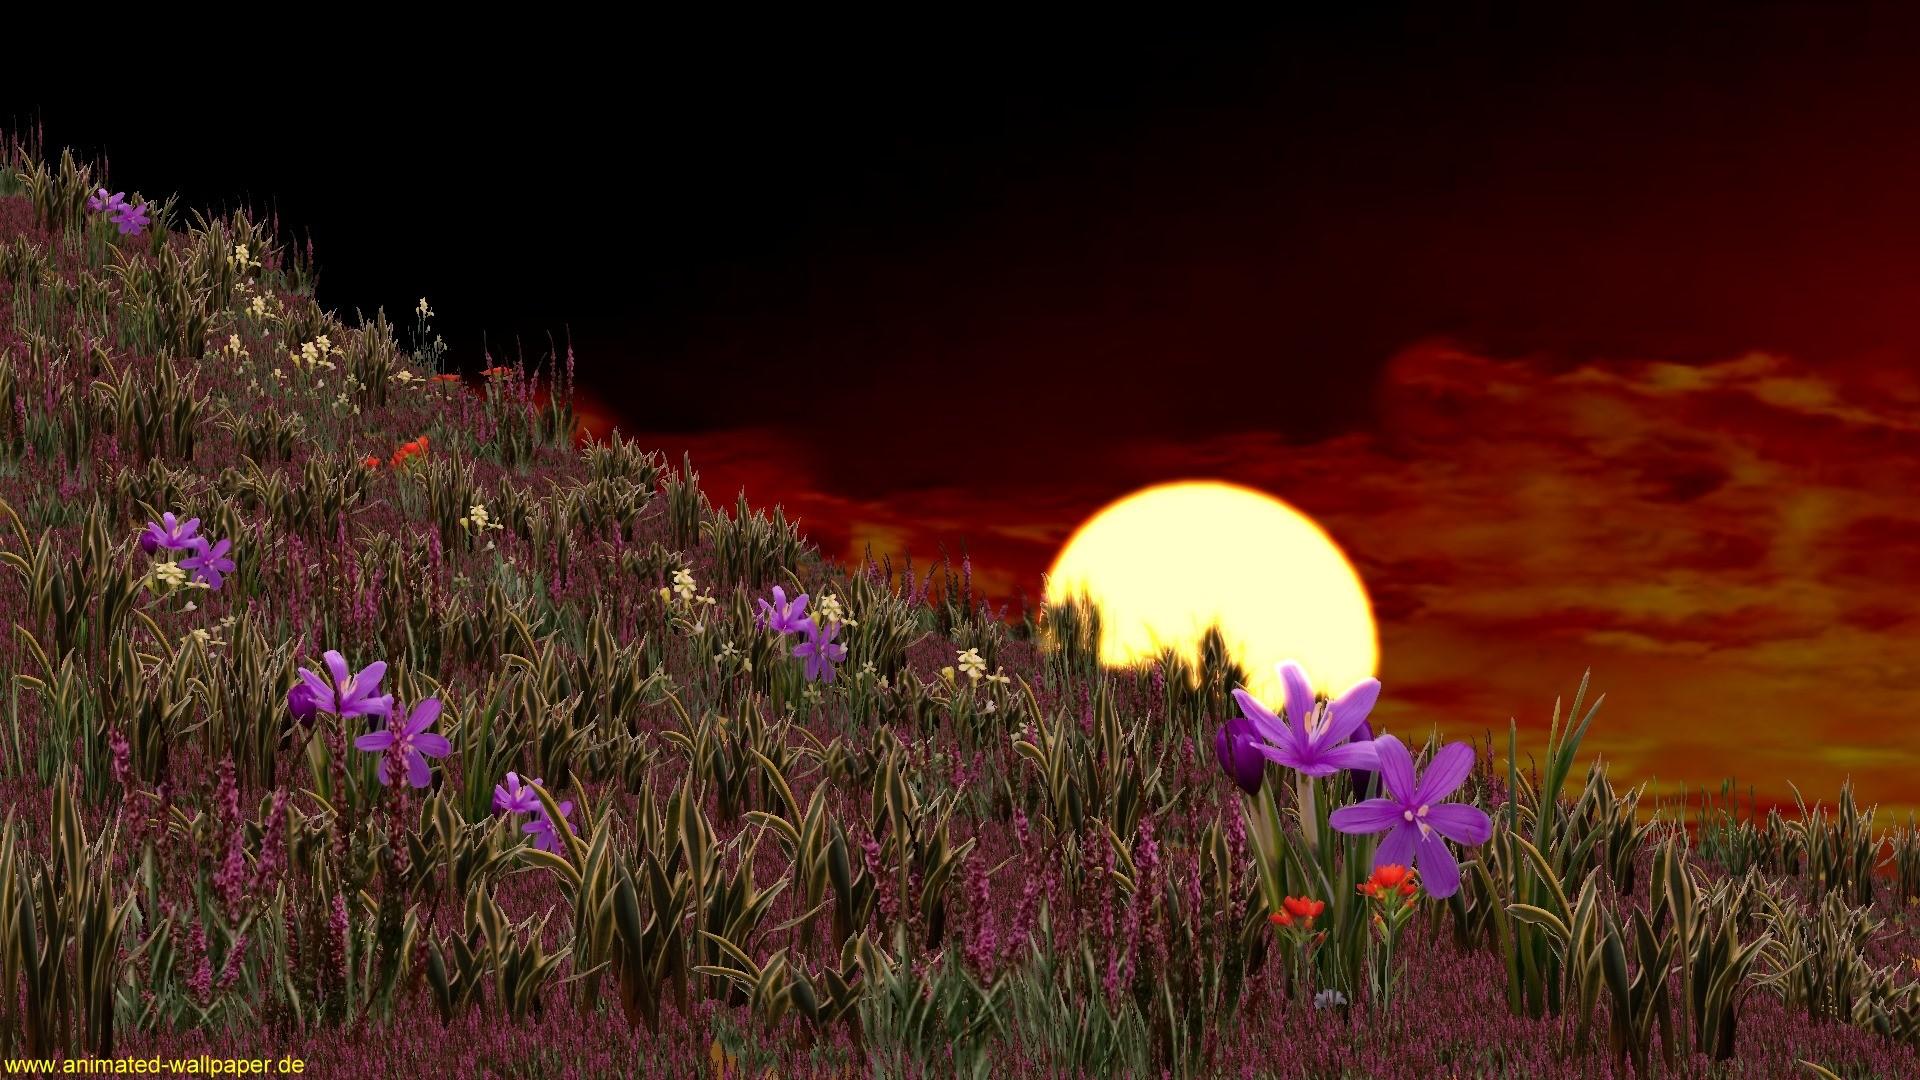 Download 3d Animated Wallpapers For Windows 8 Die 73 Besten